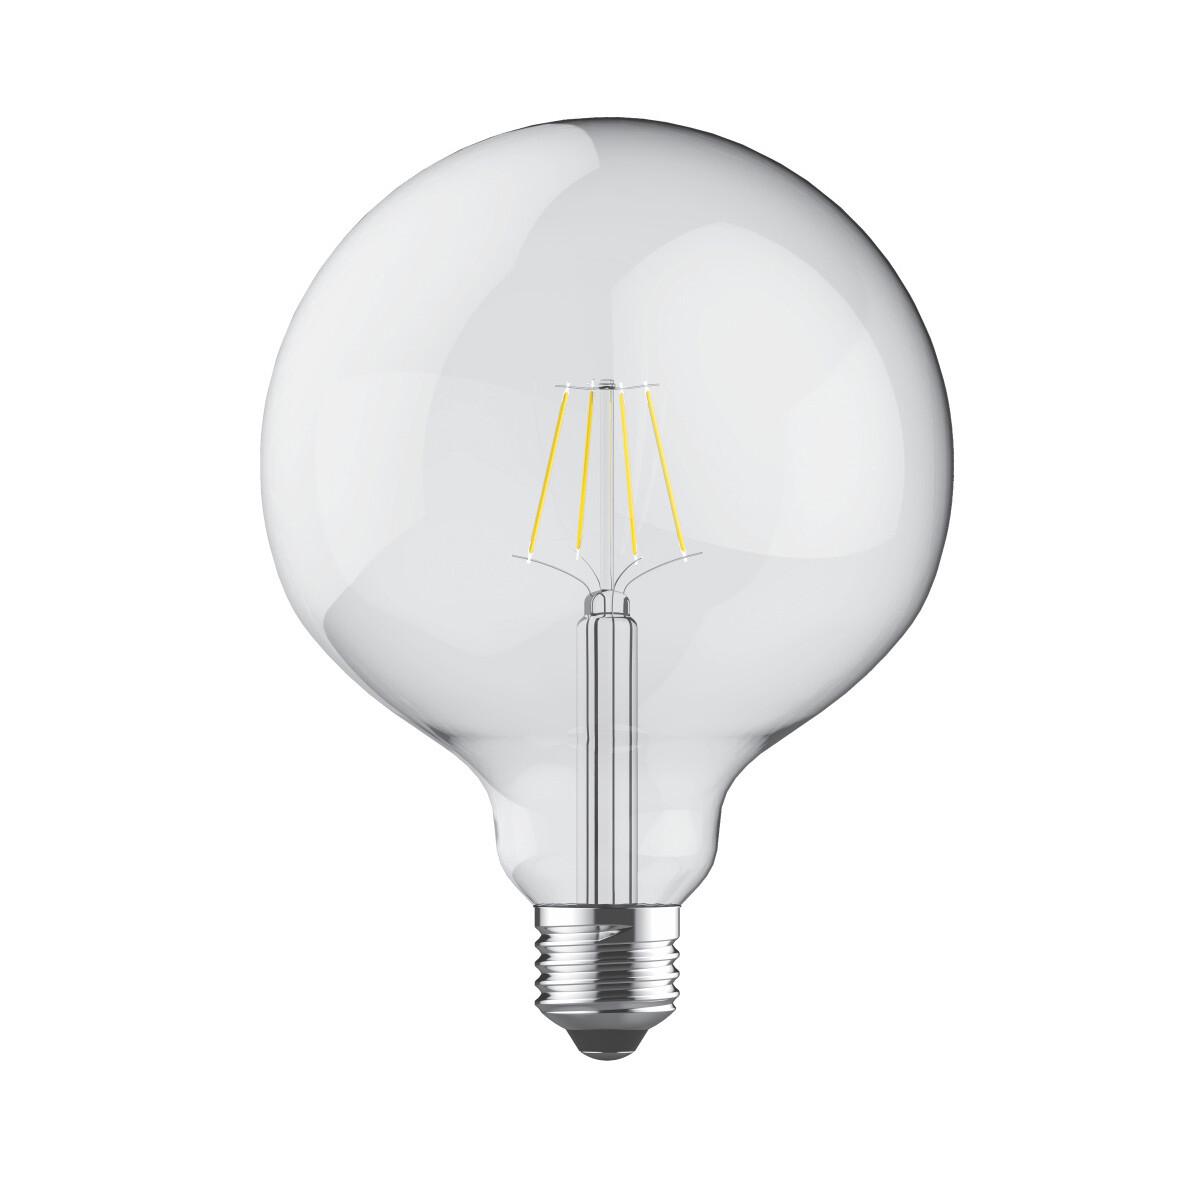 E27-LED filament Globe D125 8W 2700K (warm white) 806lm clear